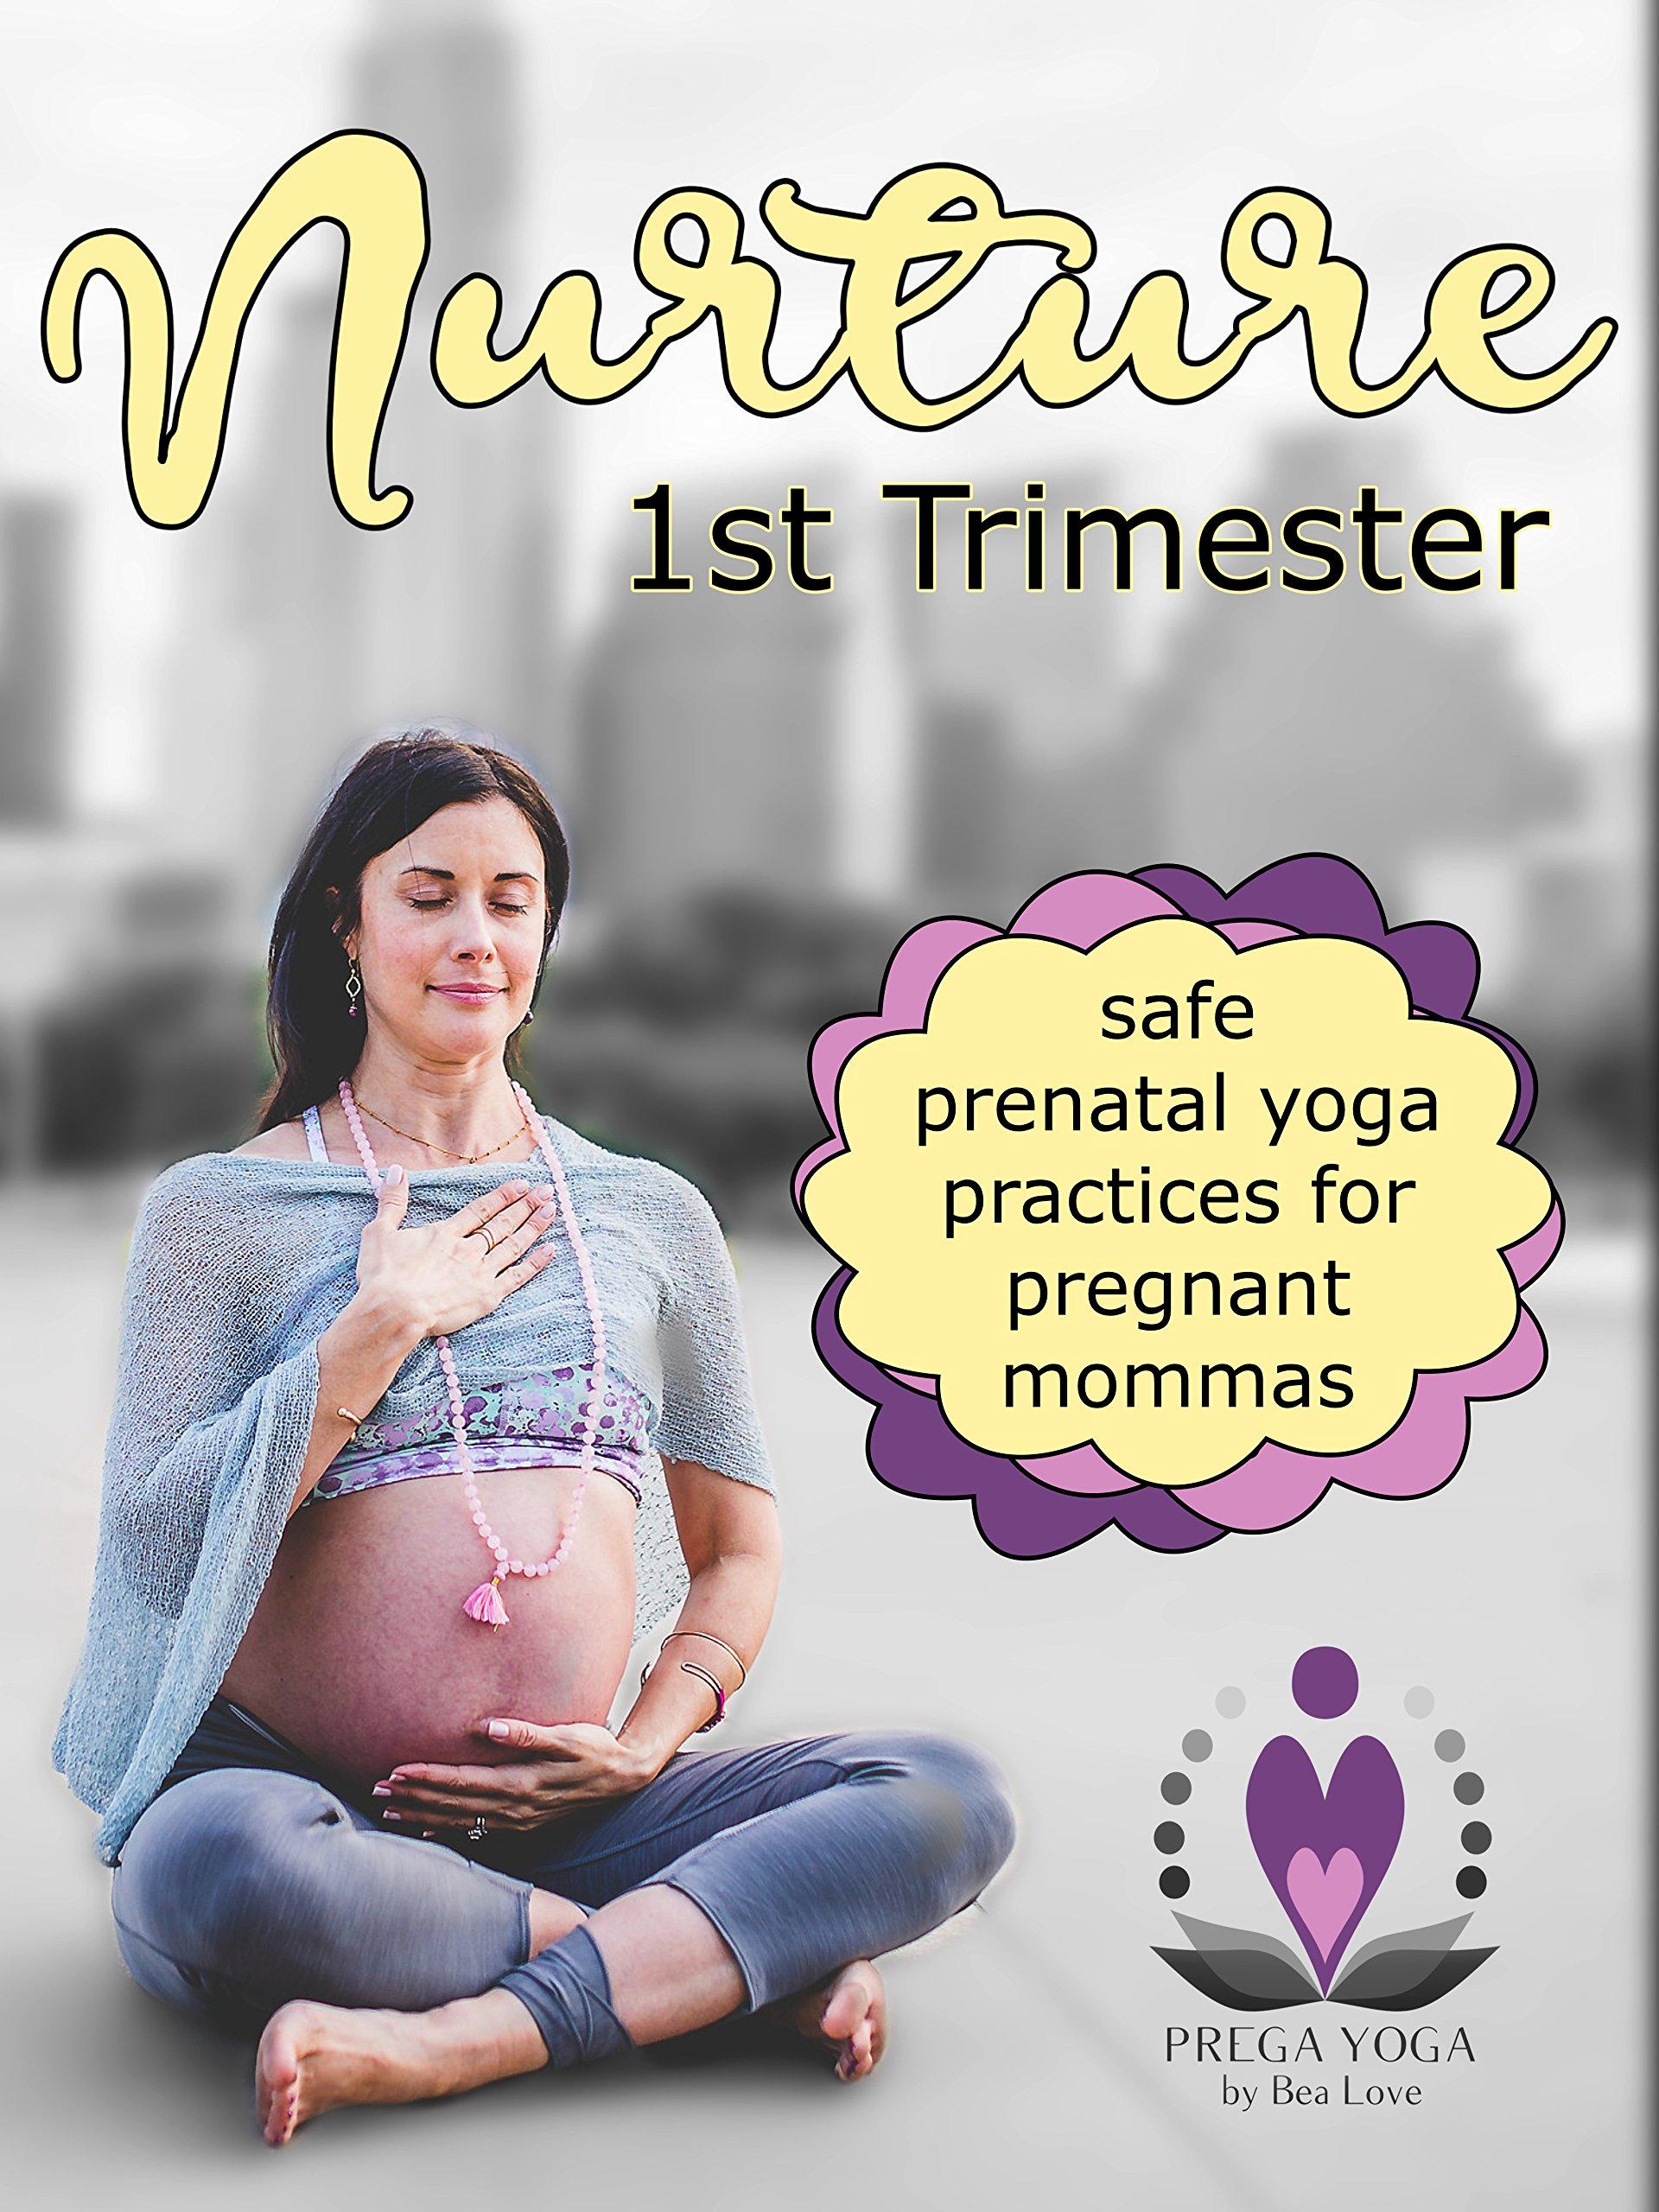 Watch Prenatal Yoga 1st Trimester Nurture Prime Video